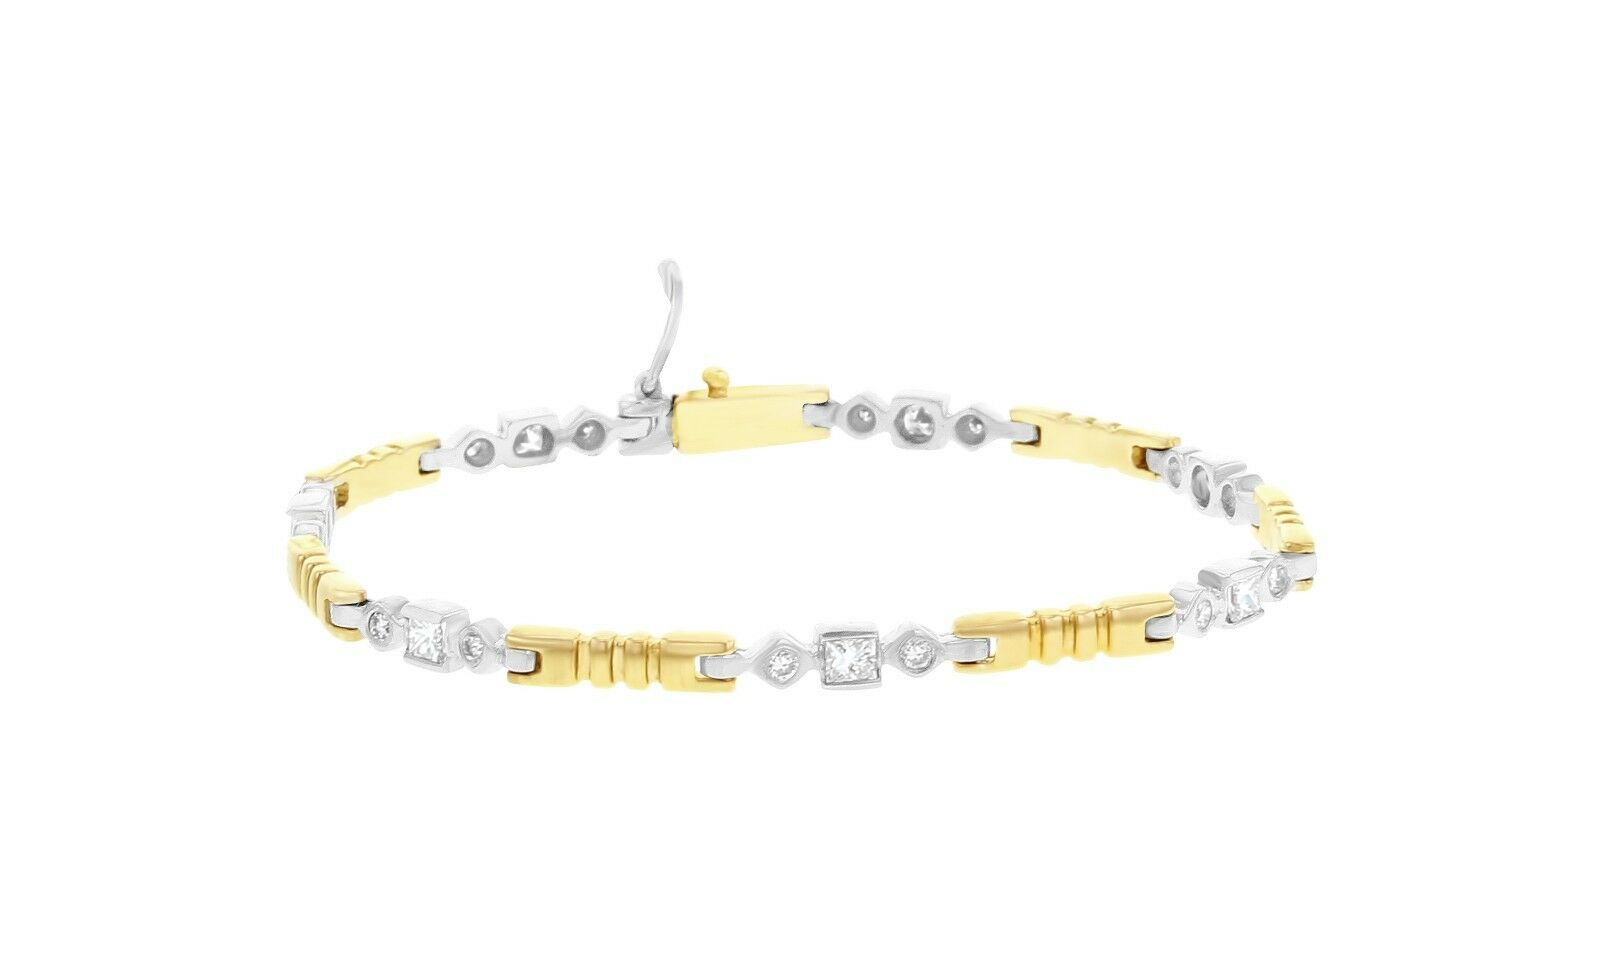 TWO TONED Princess Round DIAMOND Tennis Bracelet - 14k gold -1.00cttw - 10.5Gram